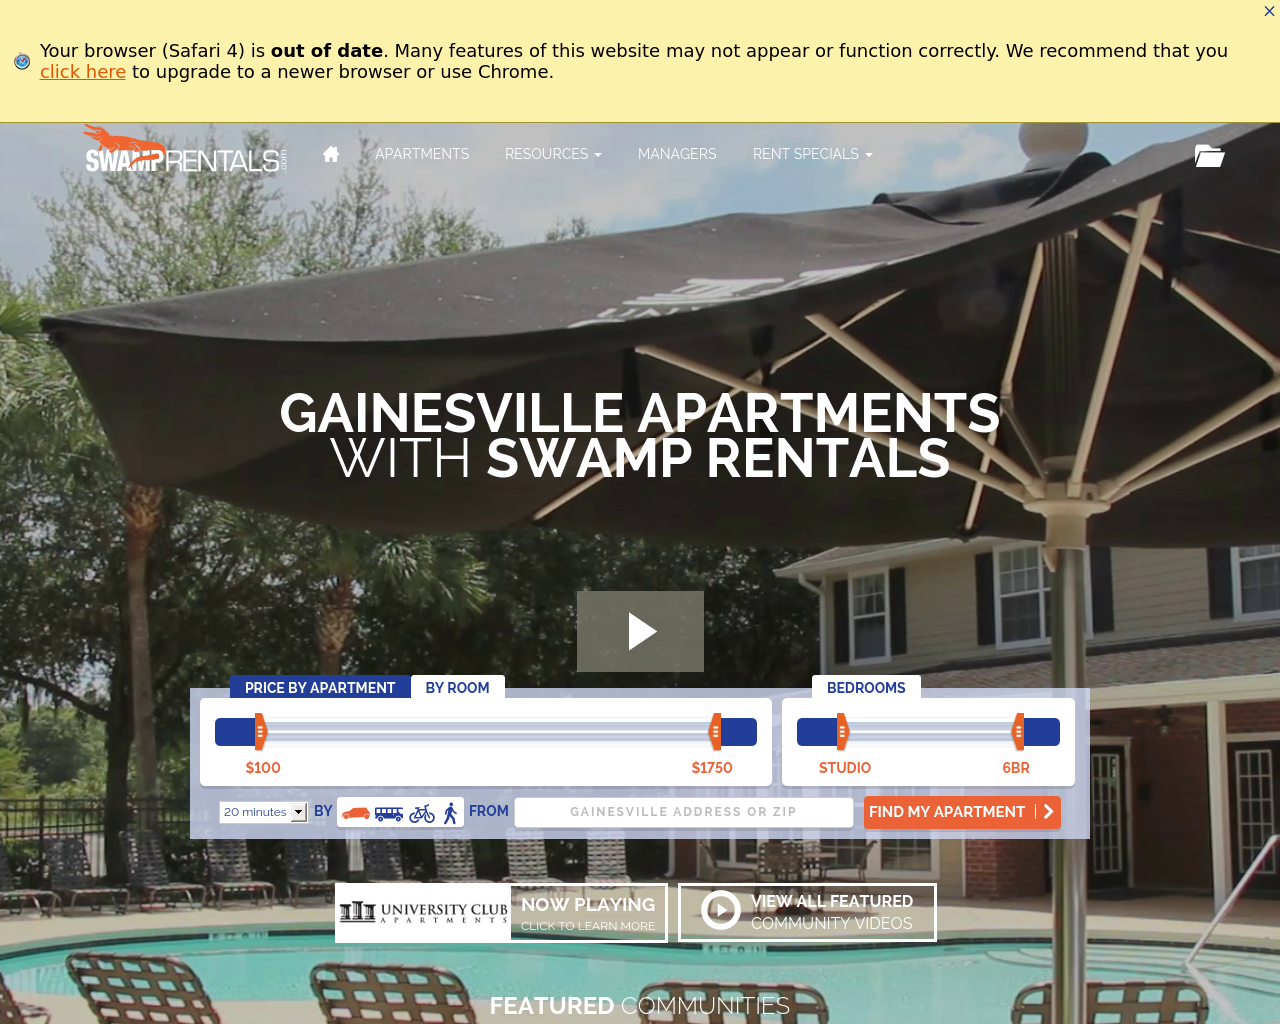 SwampRentals-Advertising-Reviews-Pricing